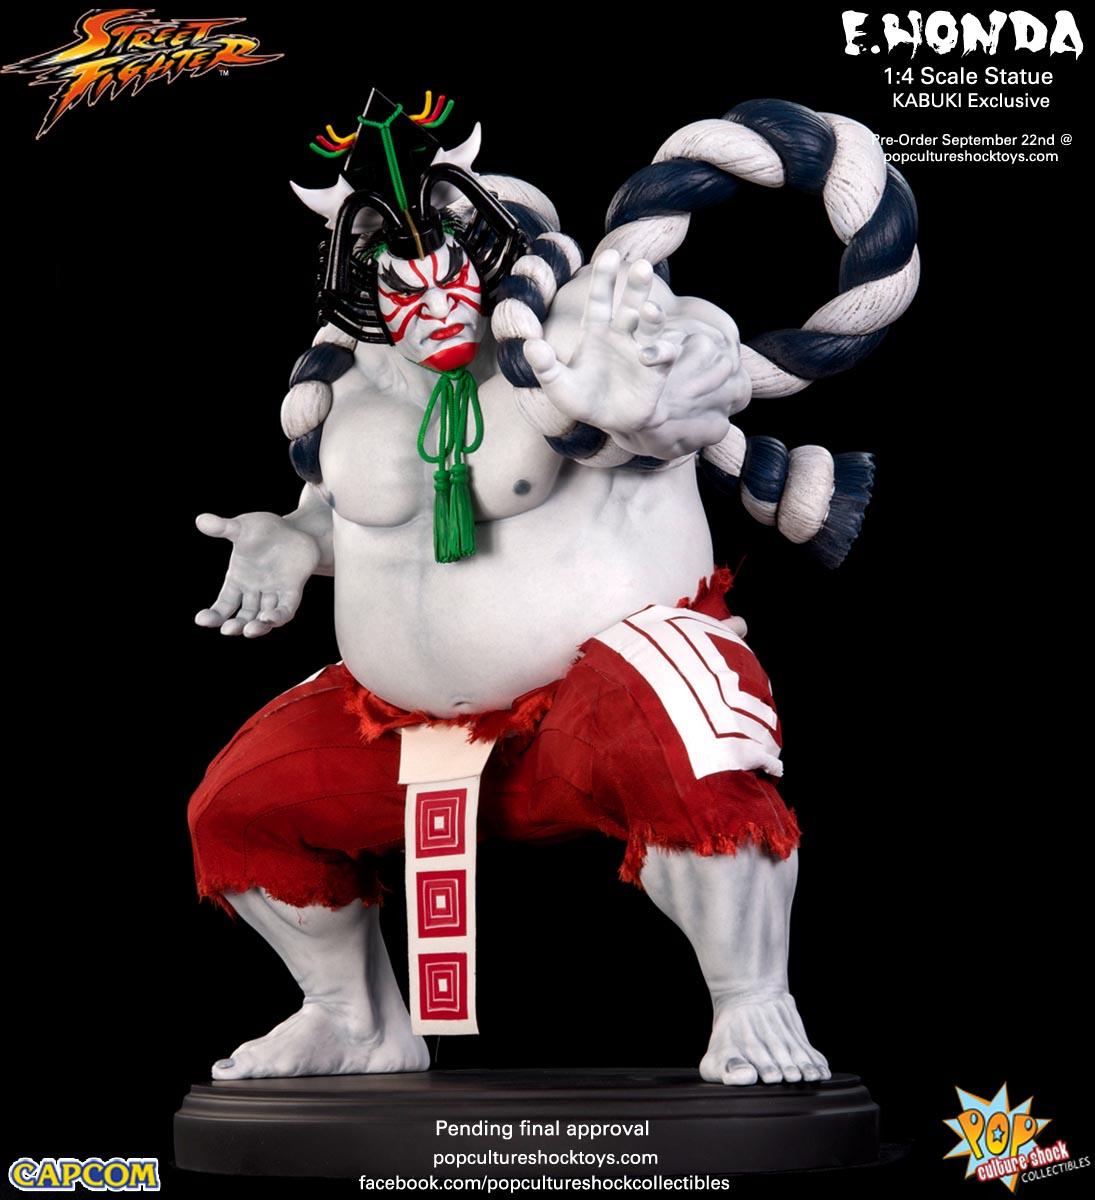 [Pop Culture Shock] Street Fighter: E. Honda 1/4 Statue - Página 3 Street-Fighter-E.-Honda-Kabuki-Statue-009